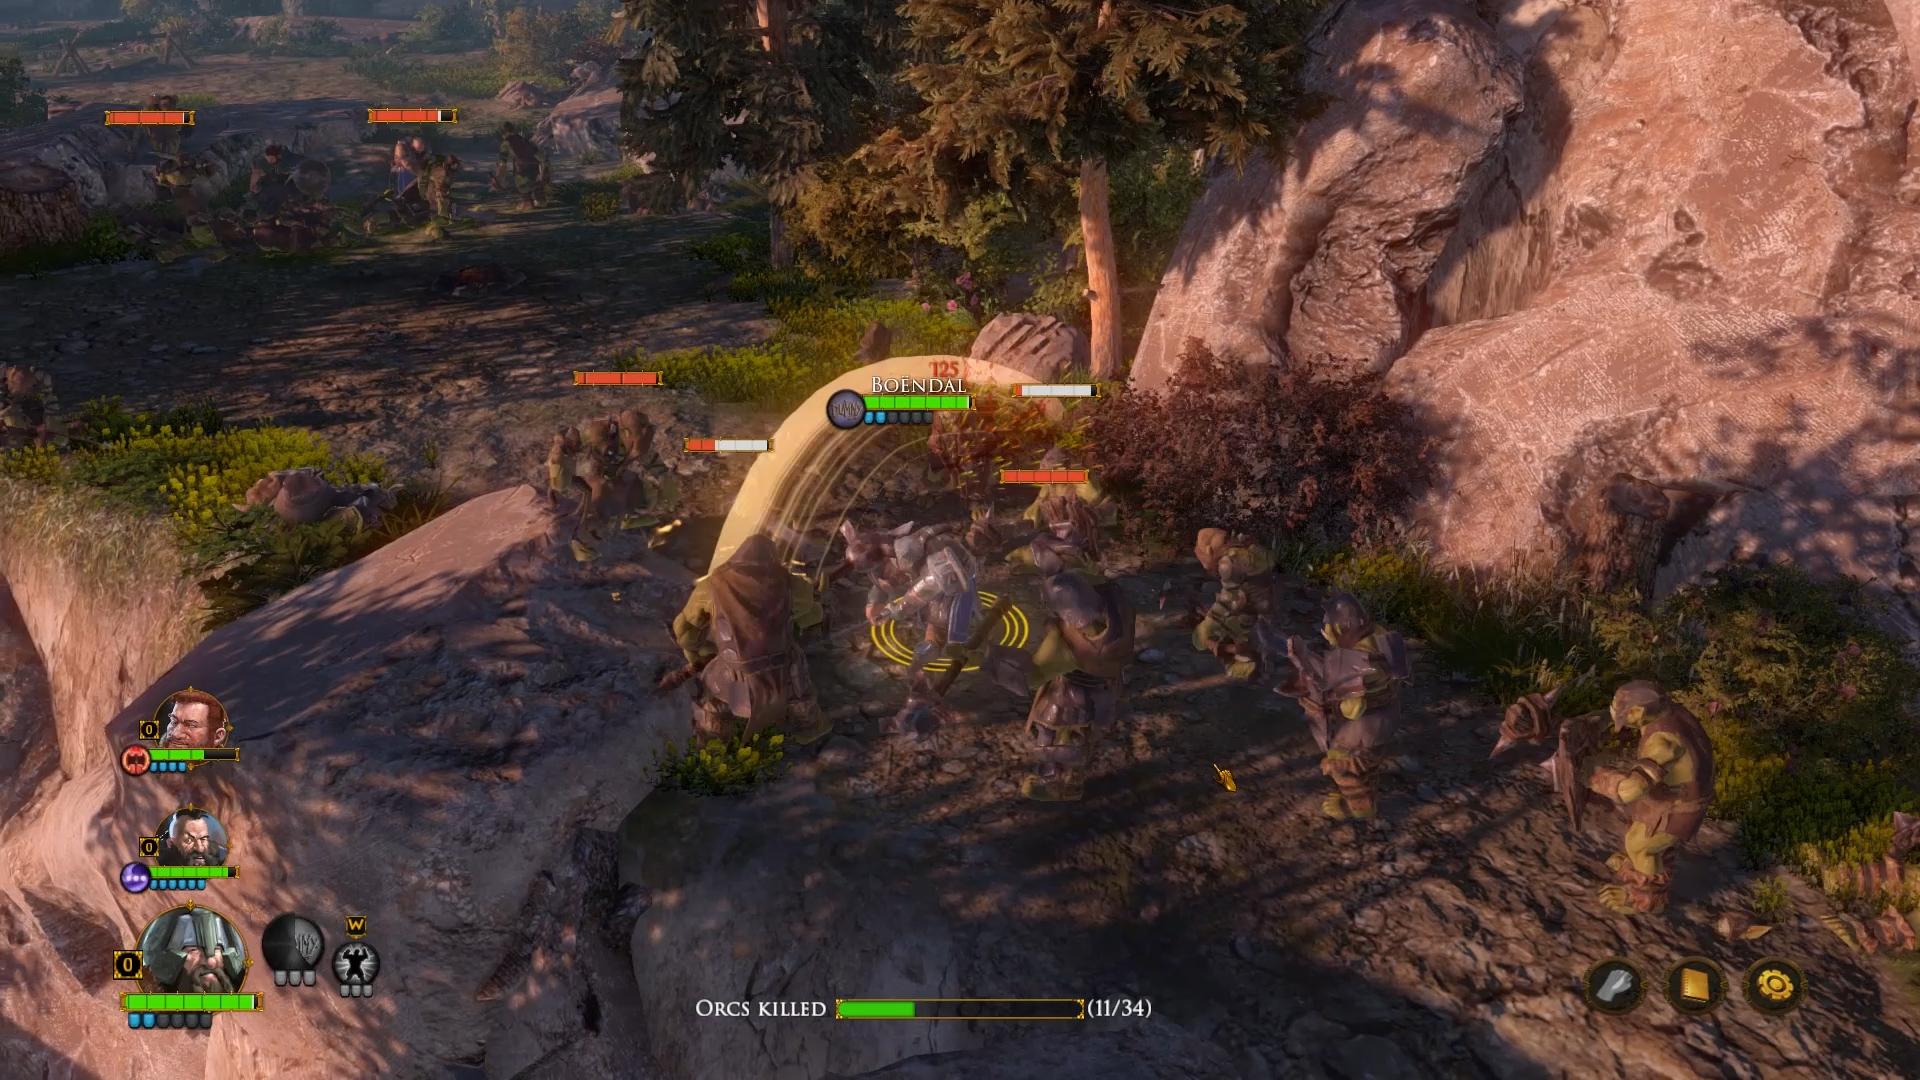 The Dwarves Screenshot 1